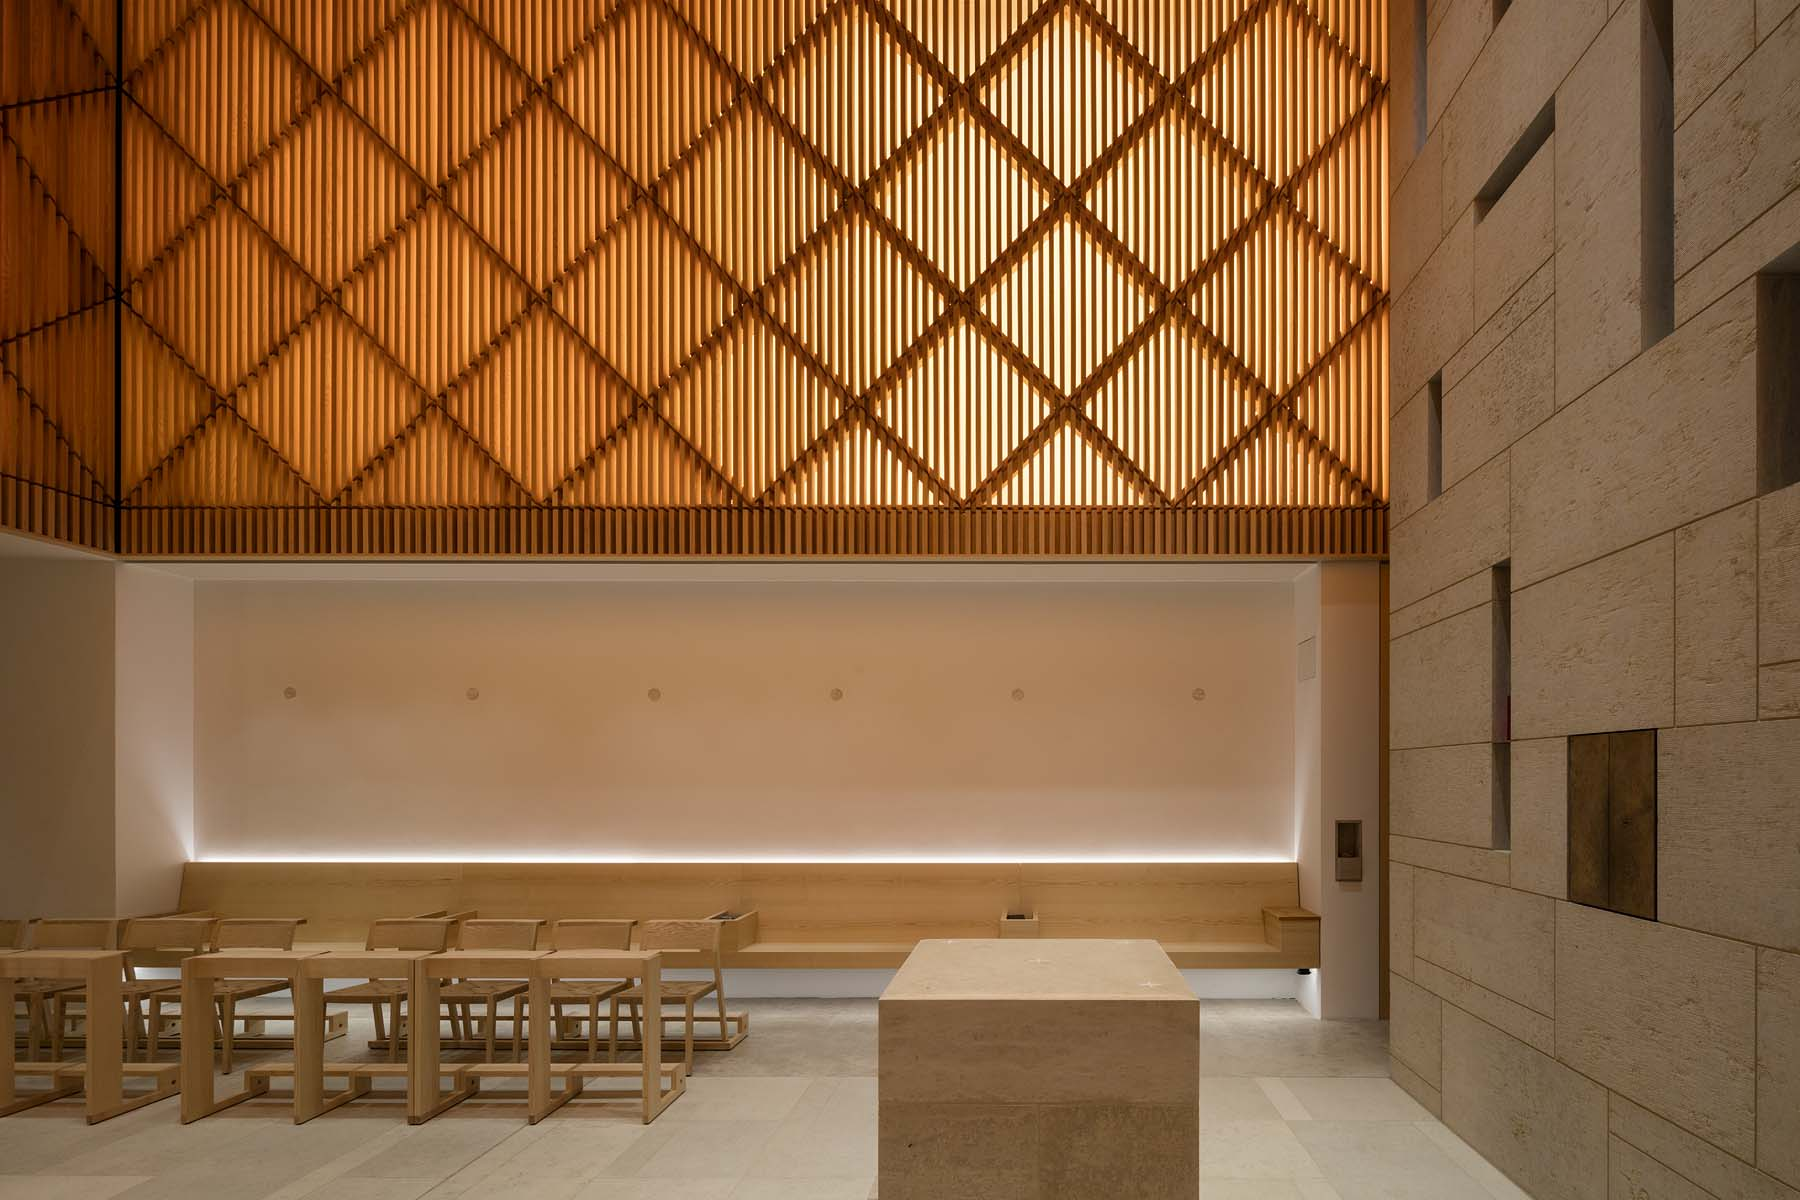 Architektur Fotografie   Jens Kirchner   Priesterseminar Paderborn